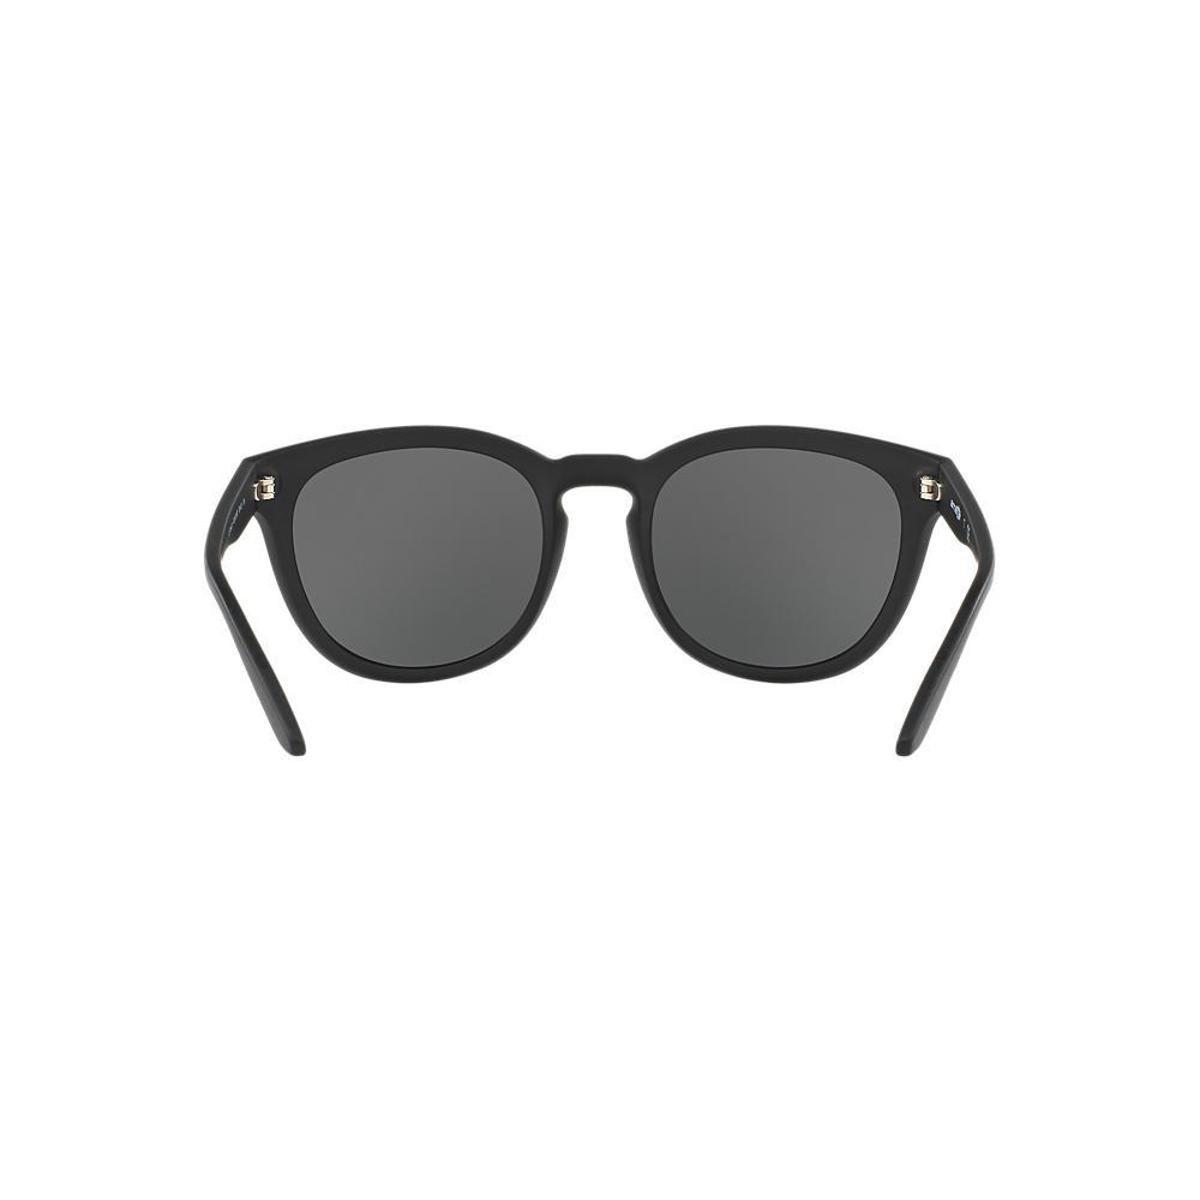 419fc29926b7c Óculos de Sol Arnette Redondo AN4230 Cut Back Masculino - Compre ...